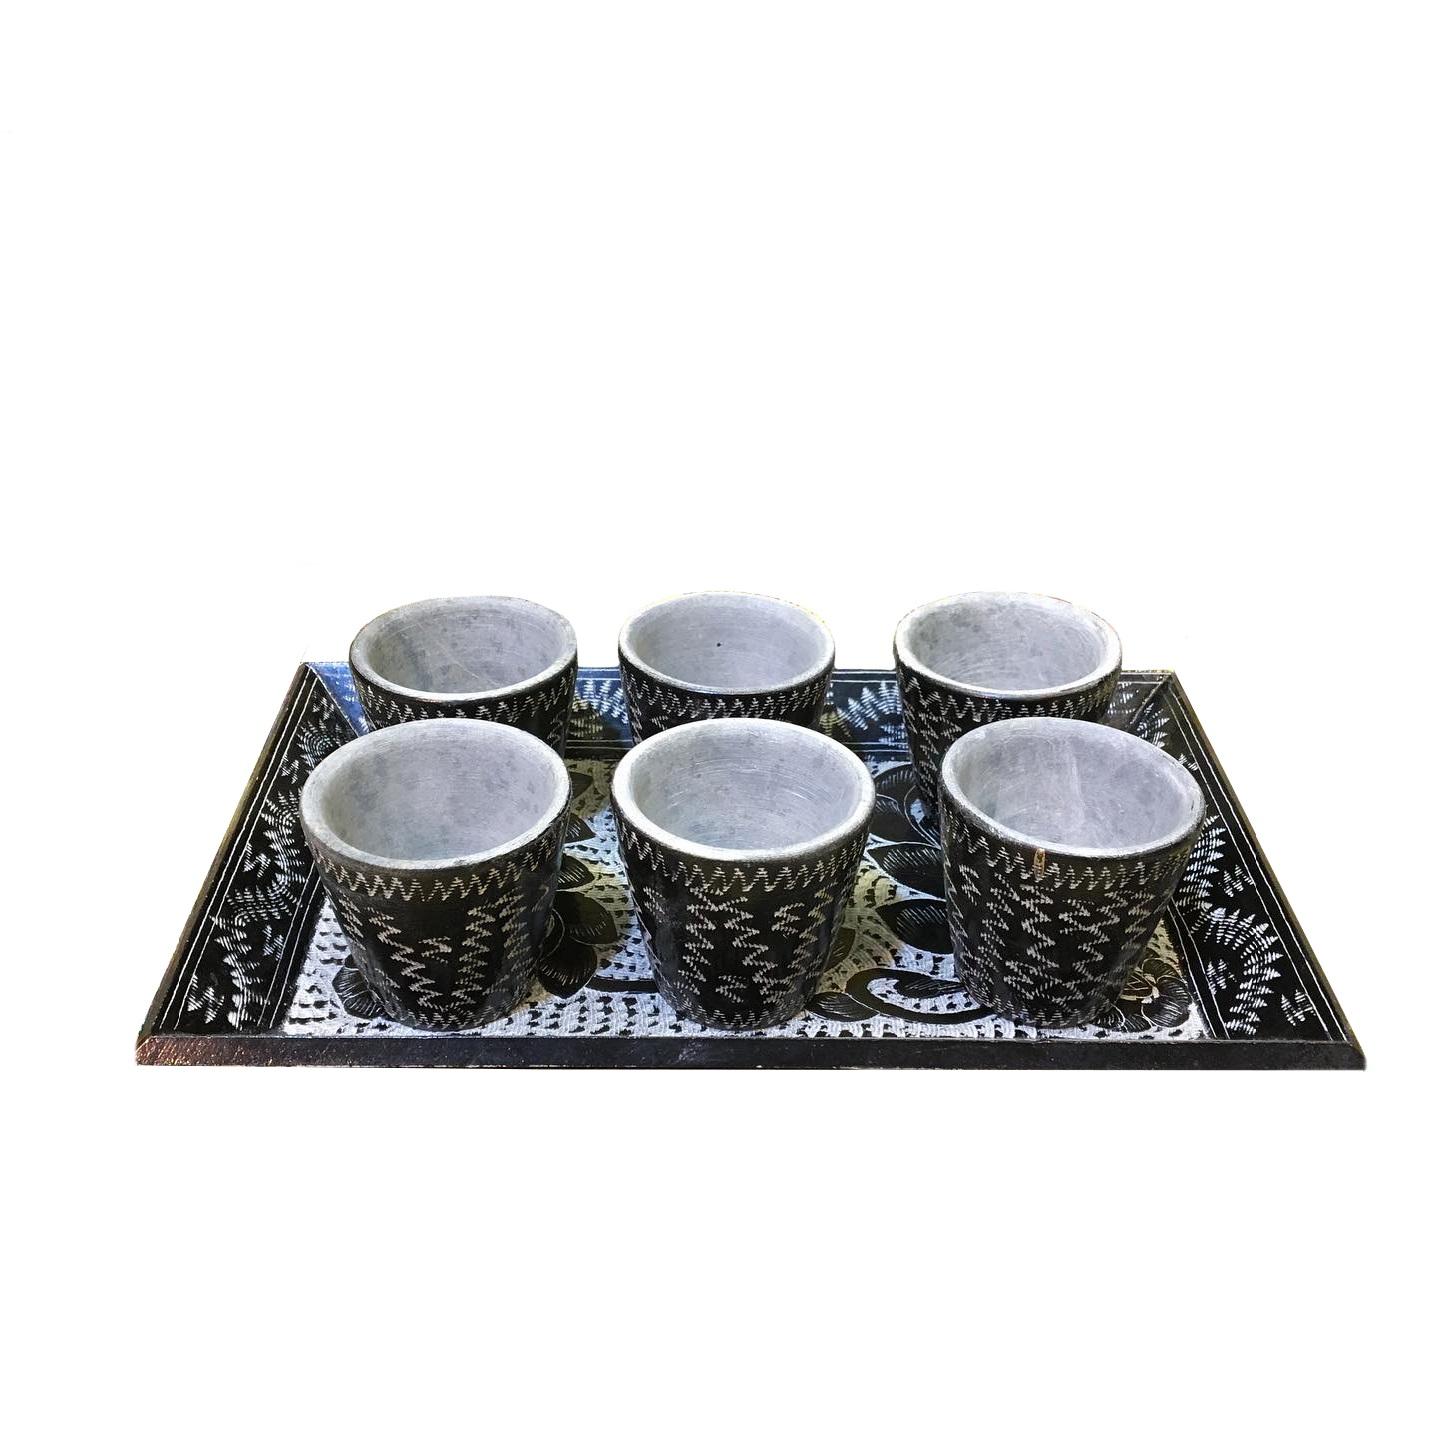 سرویس قهوه خوری سنگی 7 پارچه طرح توران کدSGHG02